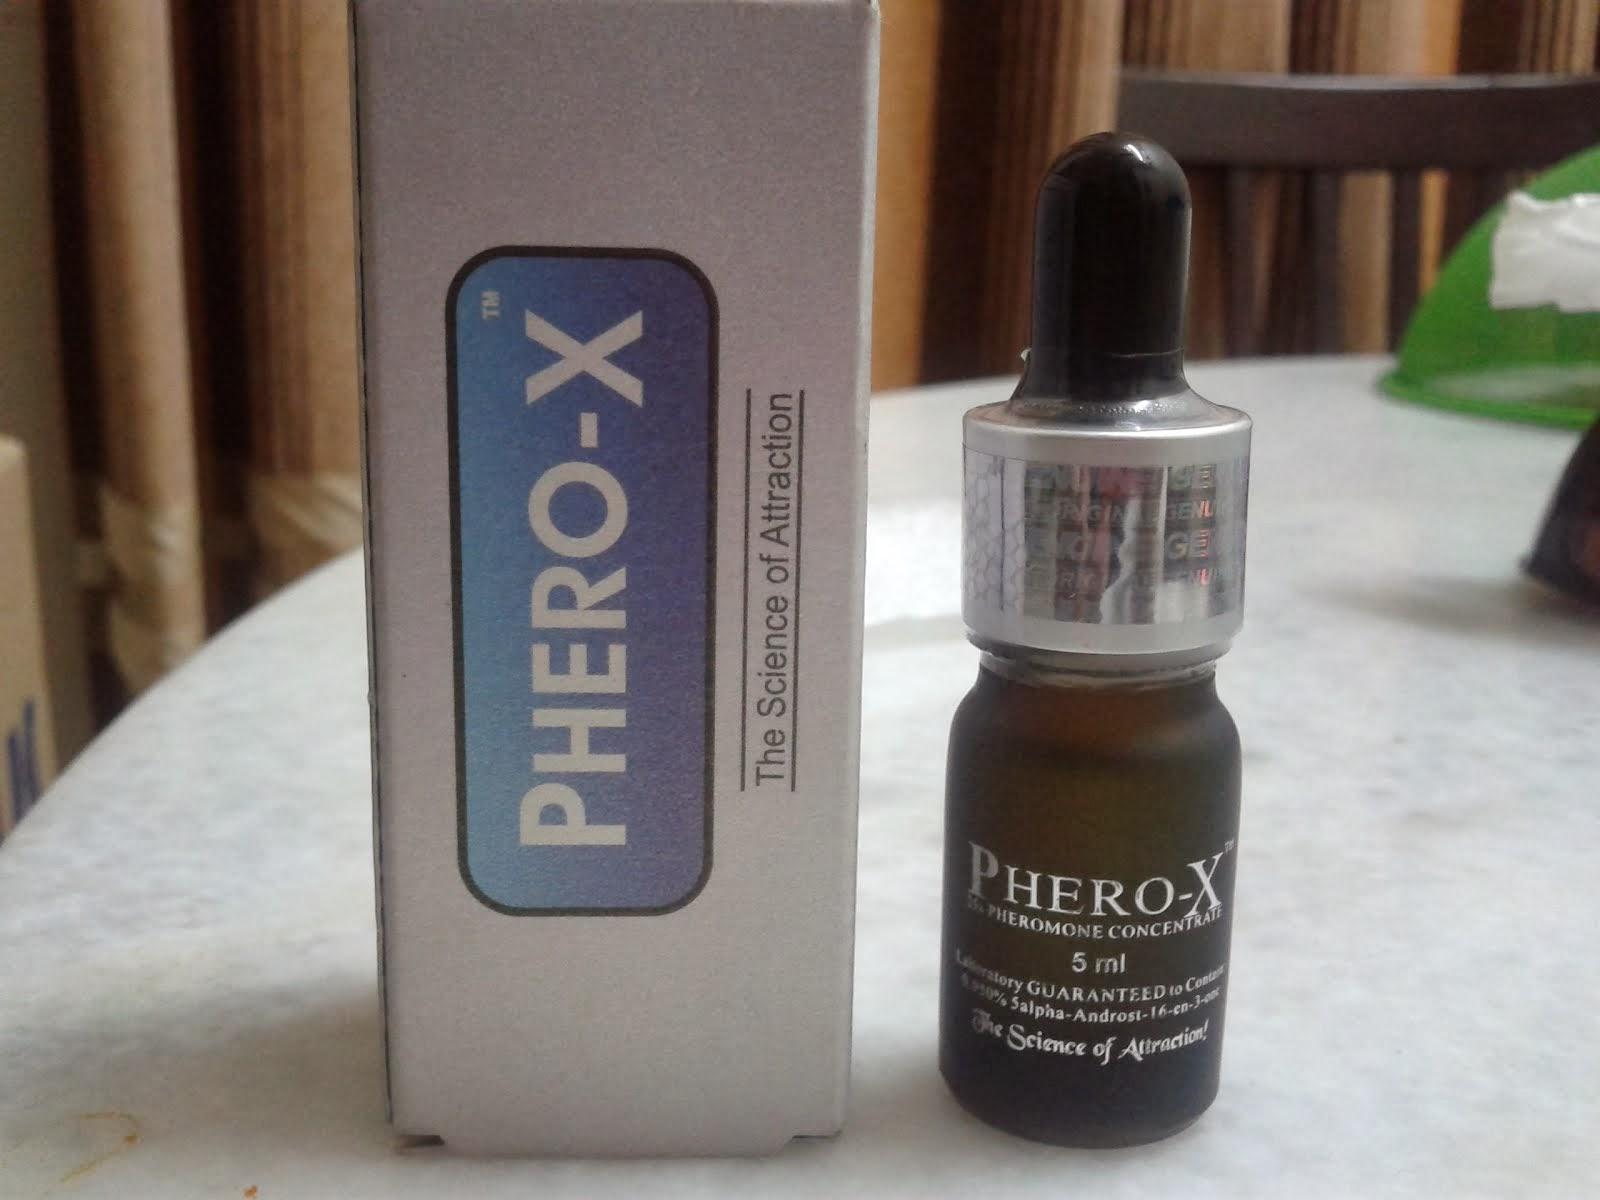 Phero-X